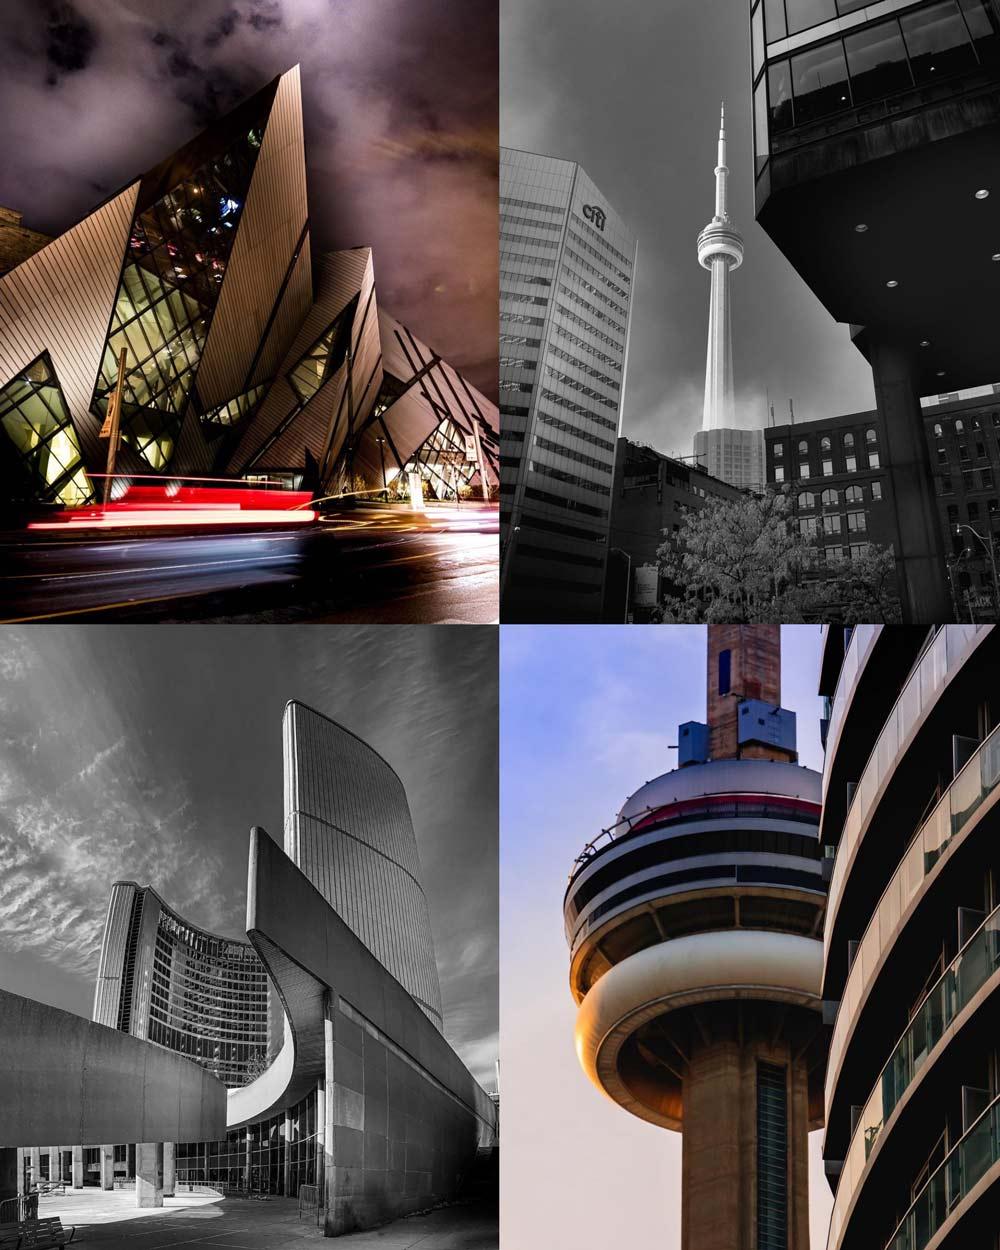 Photos by Toronto photographer Scott Harrald aka @scott_harrald